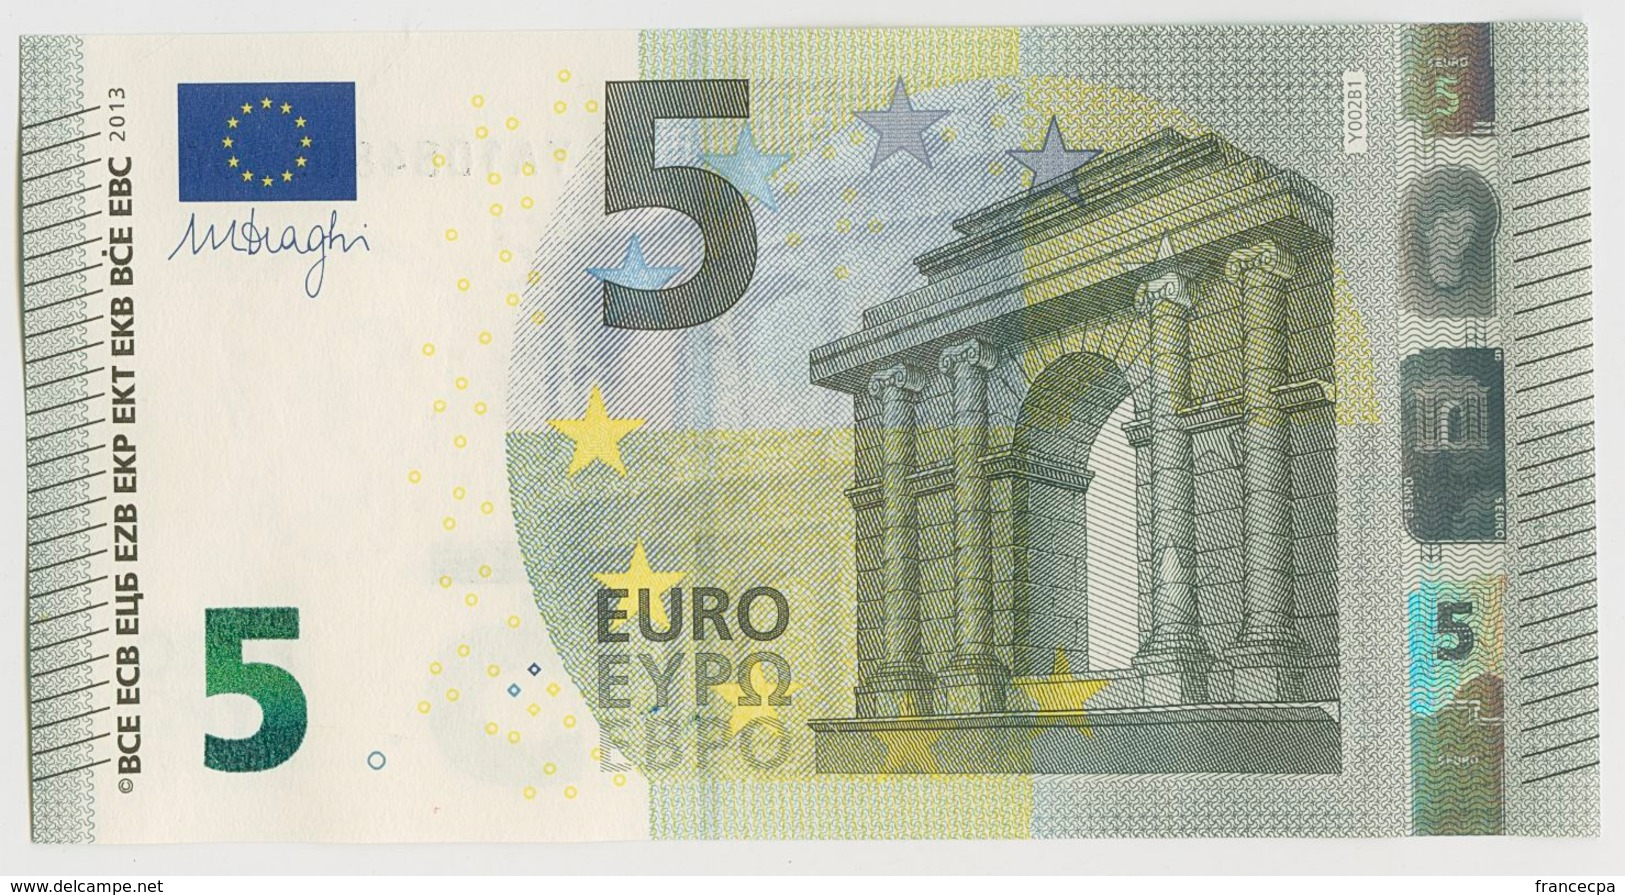 012 - BILLET 5 EURO 2013 NEUF Signature Mario DRAGHI YA 1084803236 - Imp Y002B1 - EURO